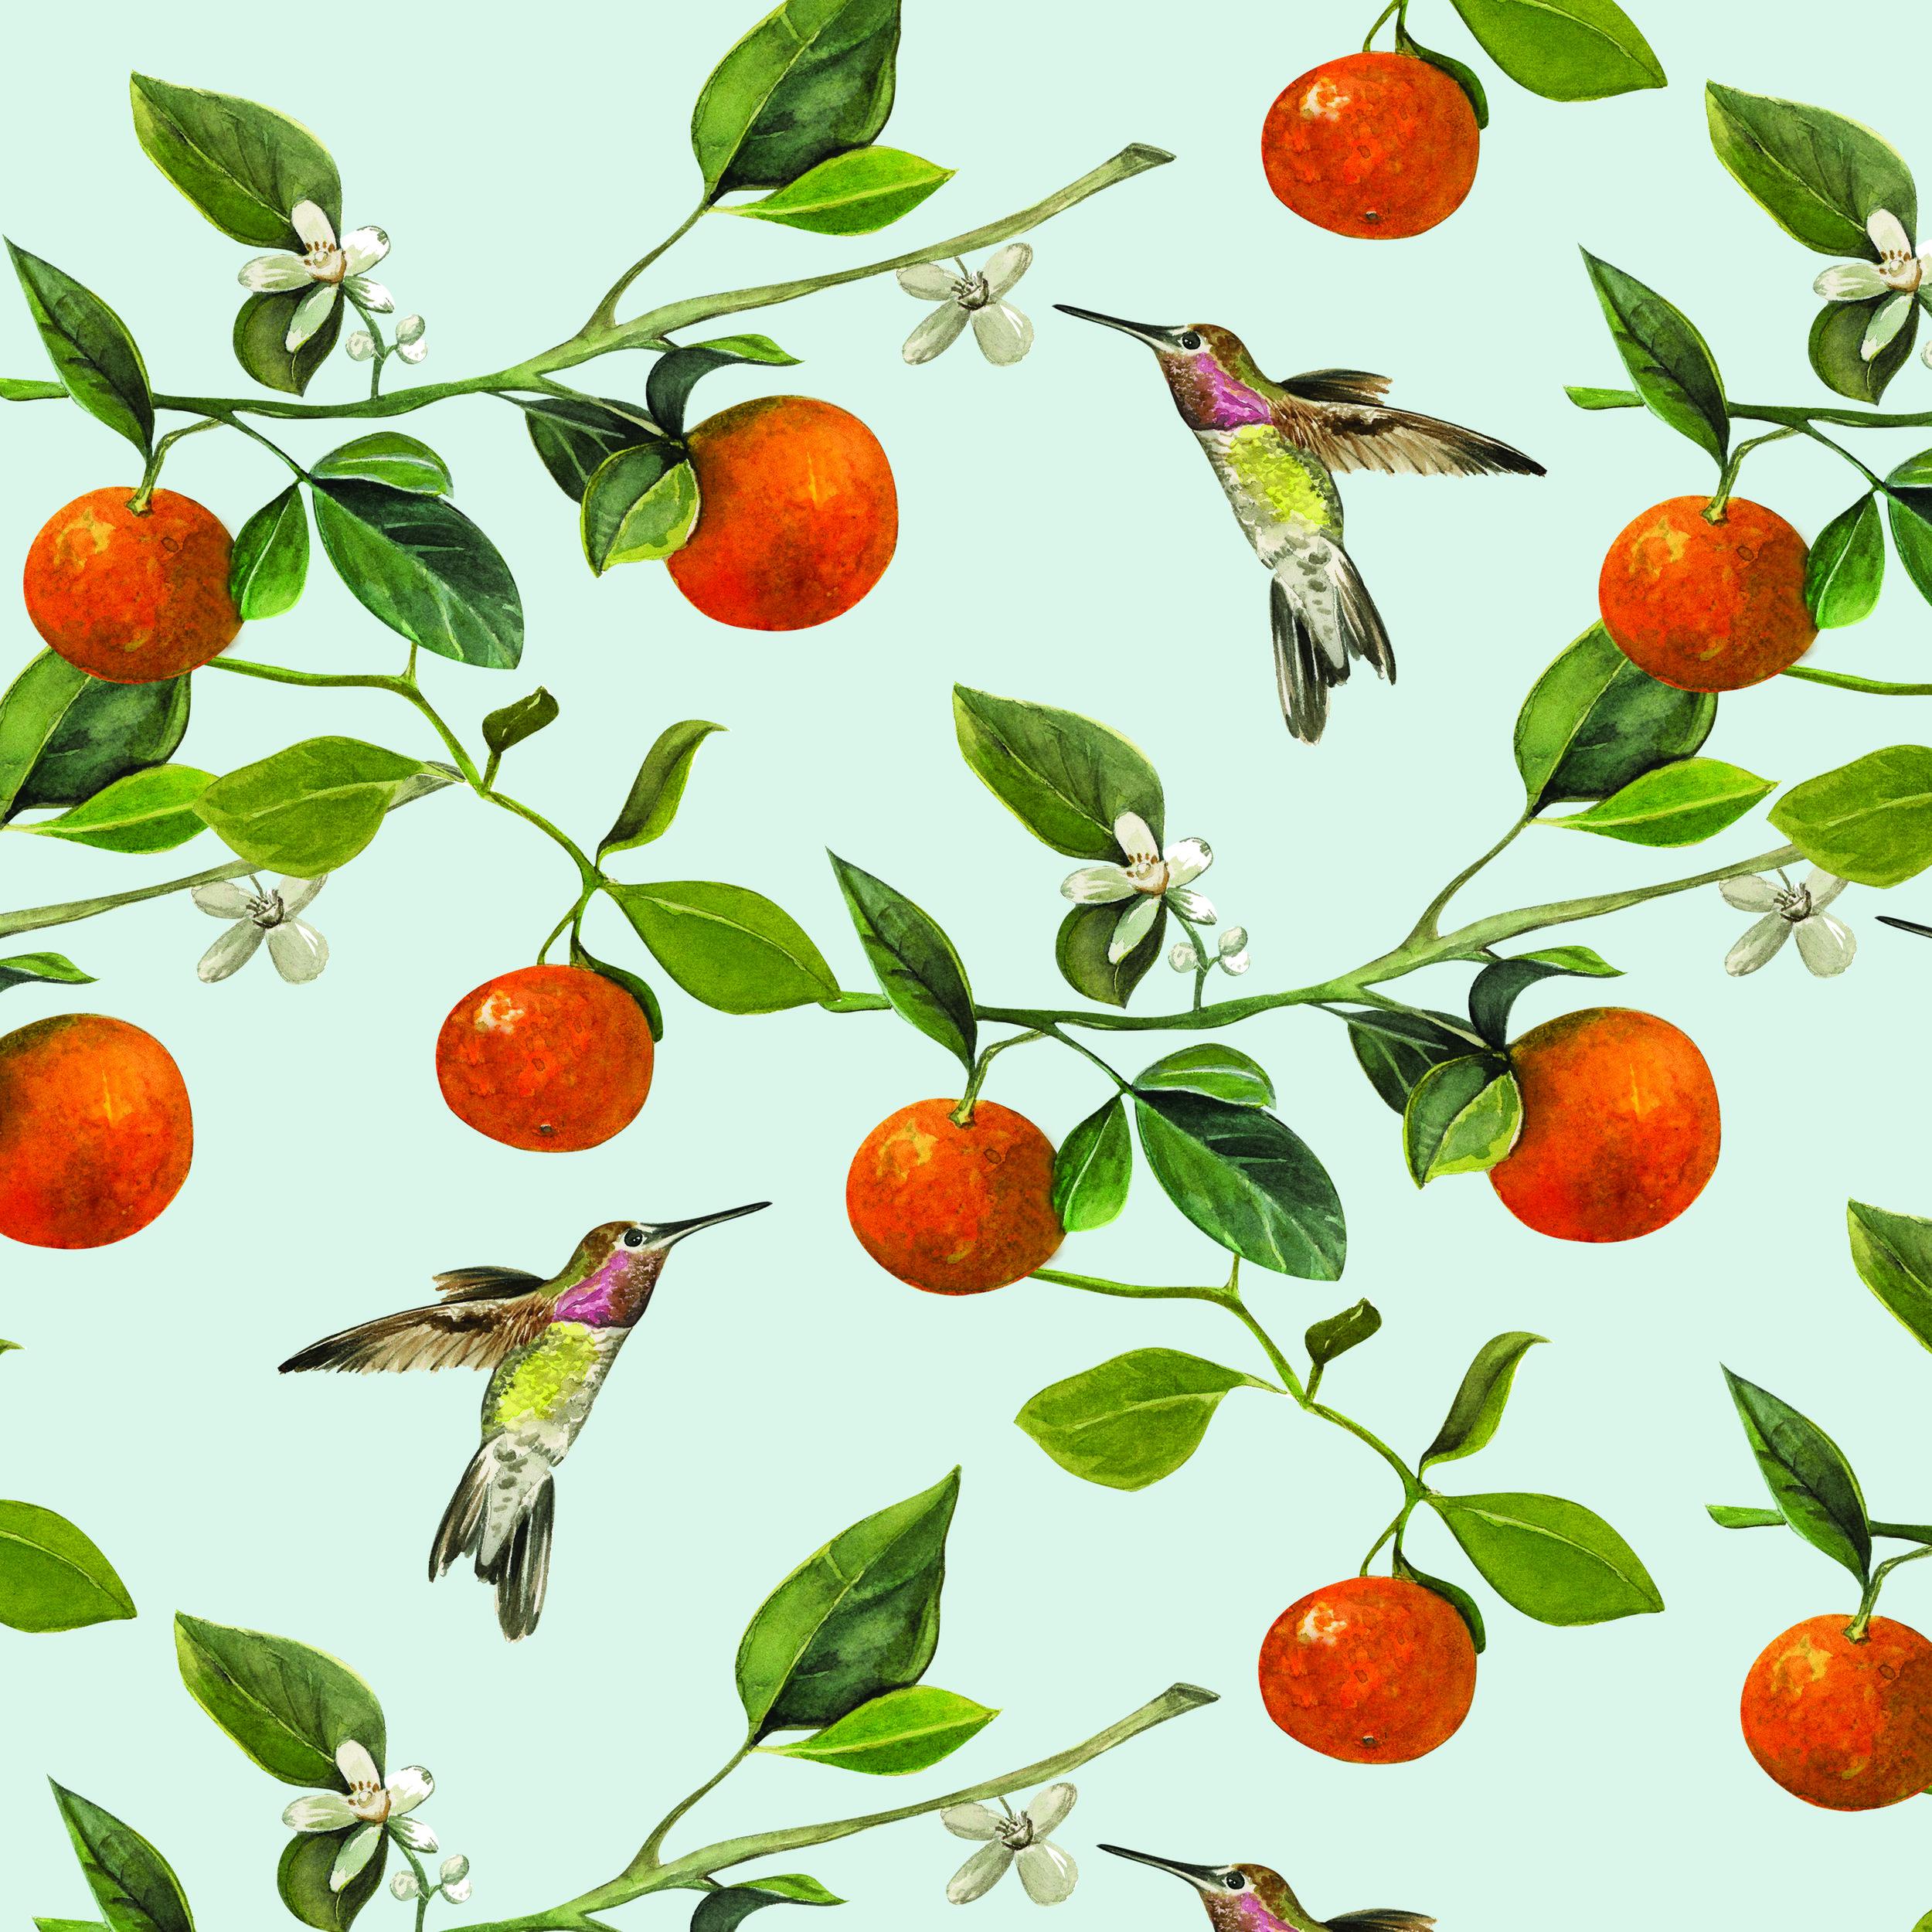 hummingbirdorange18x18adaptive.jpg